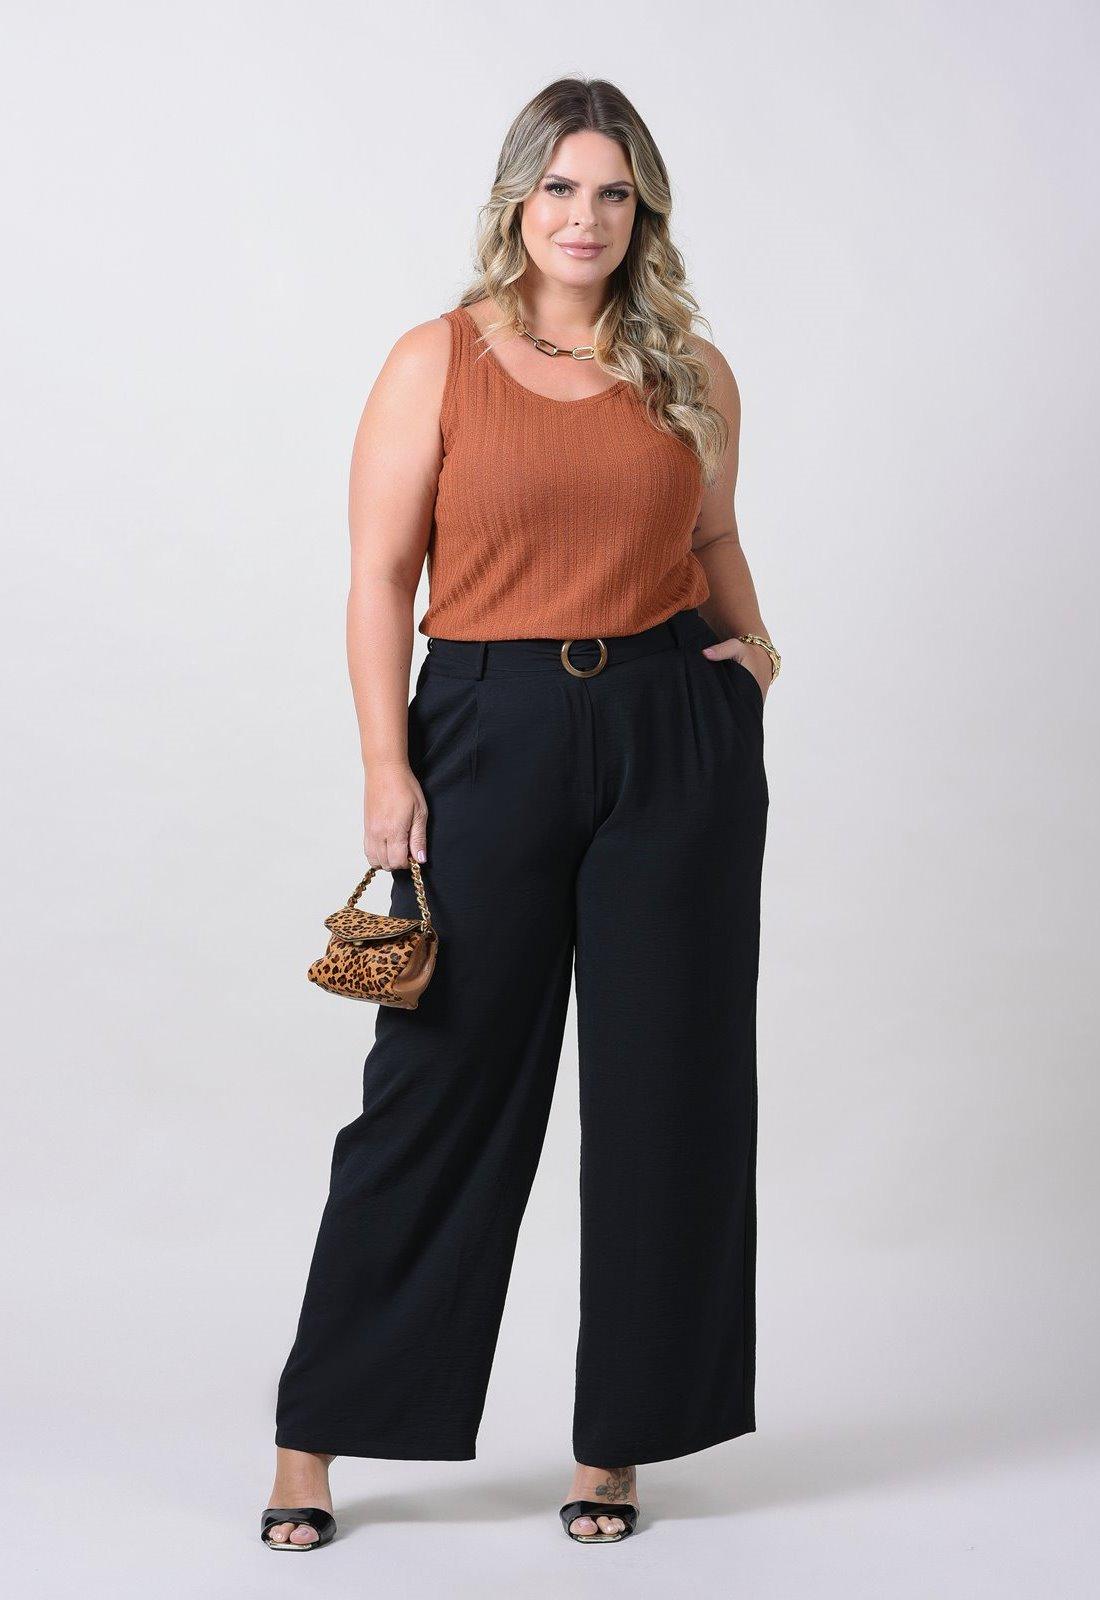 Calça plus size pantalona com cinto Ref.  U65721